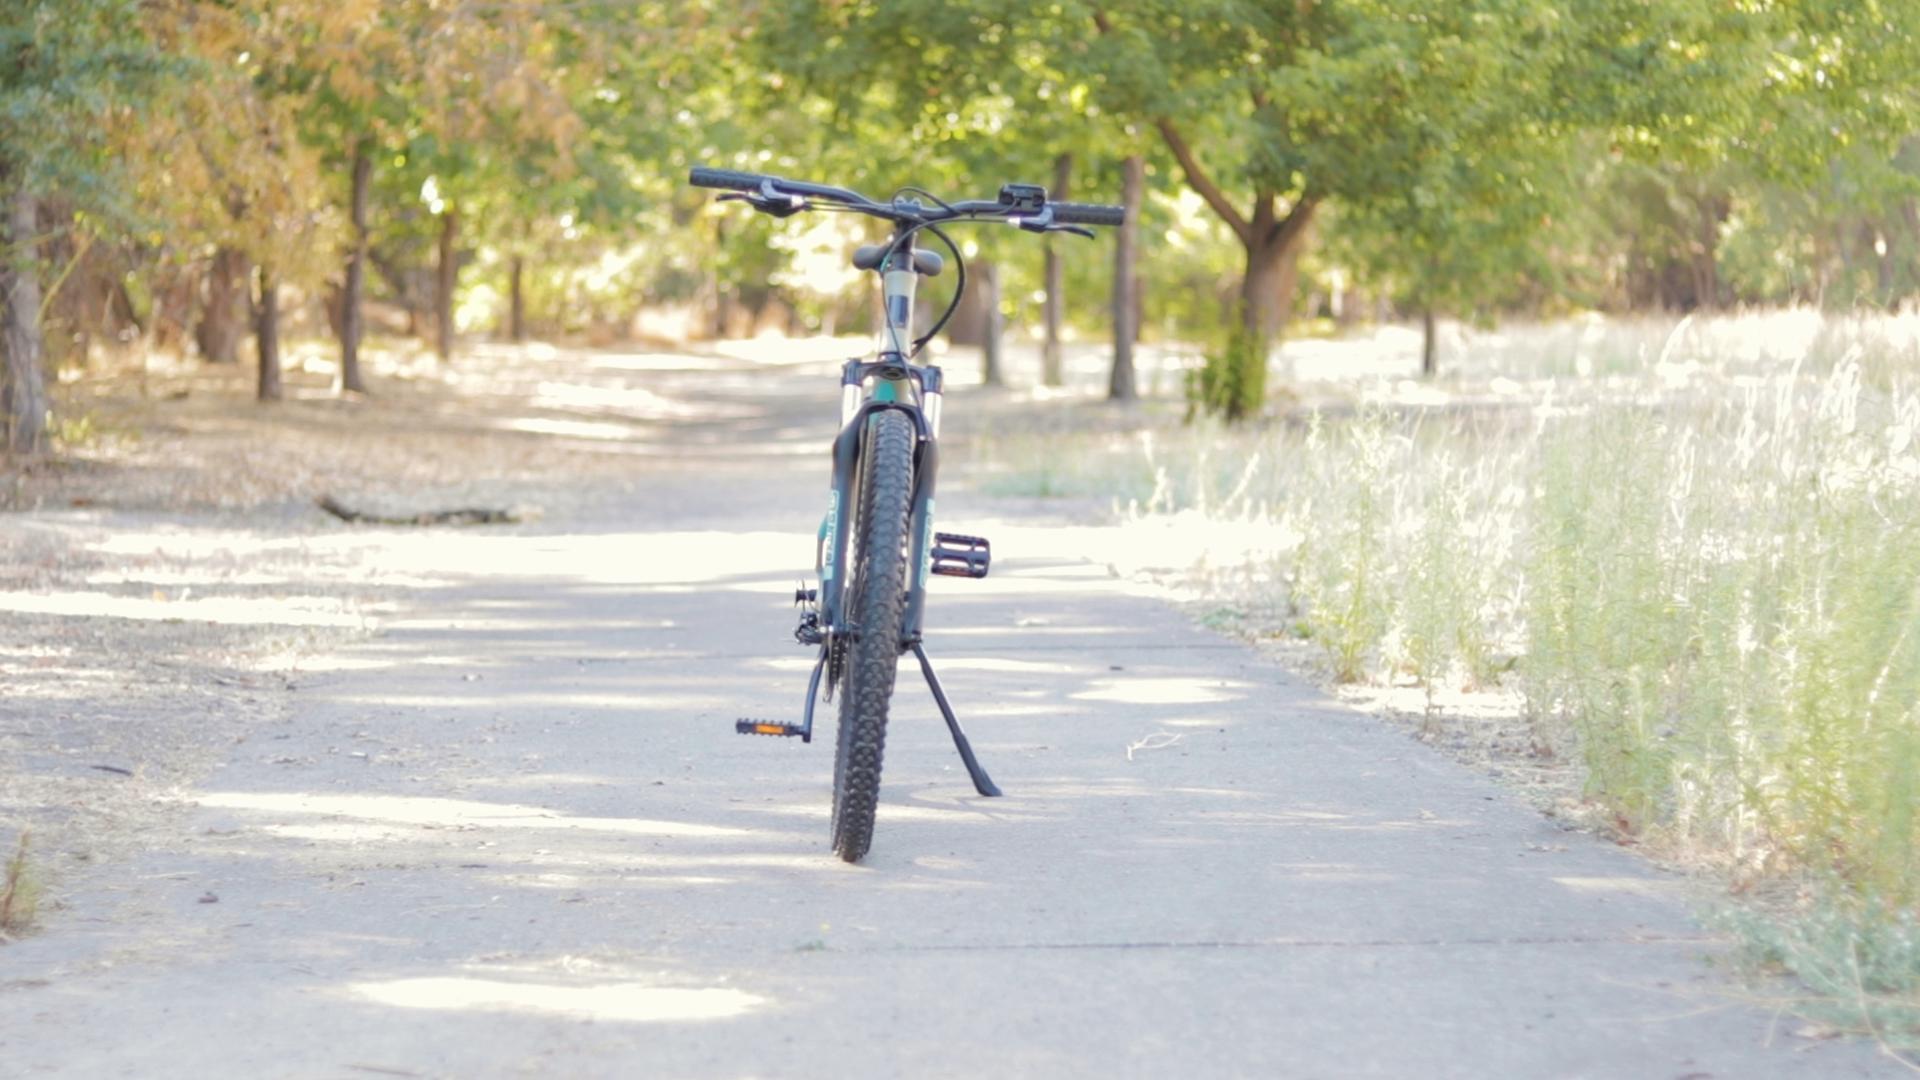 electrified-reviews-izip-trlz-electric-bike-review-front.jpg